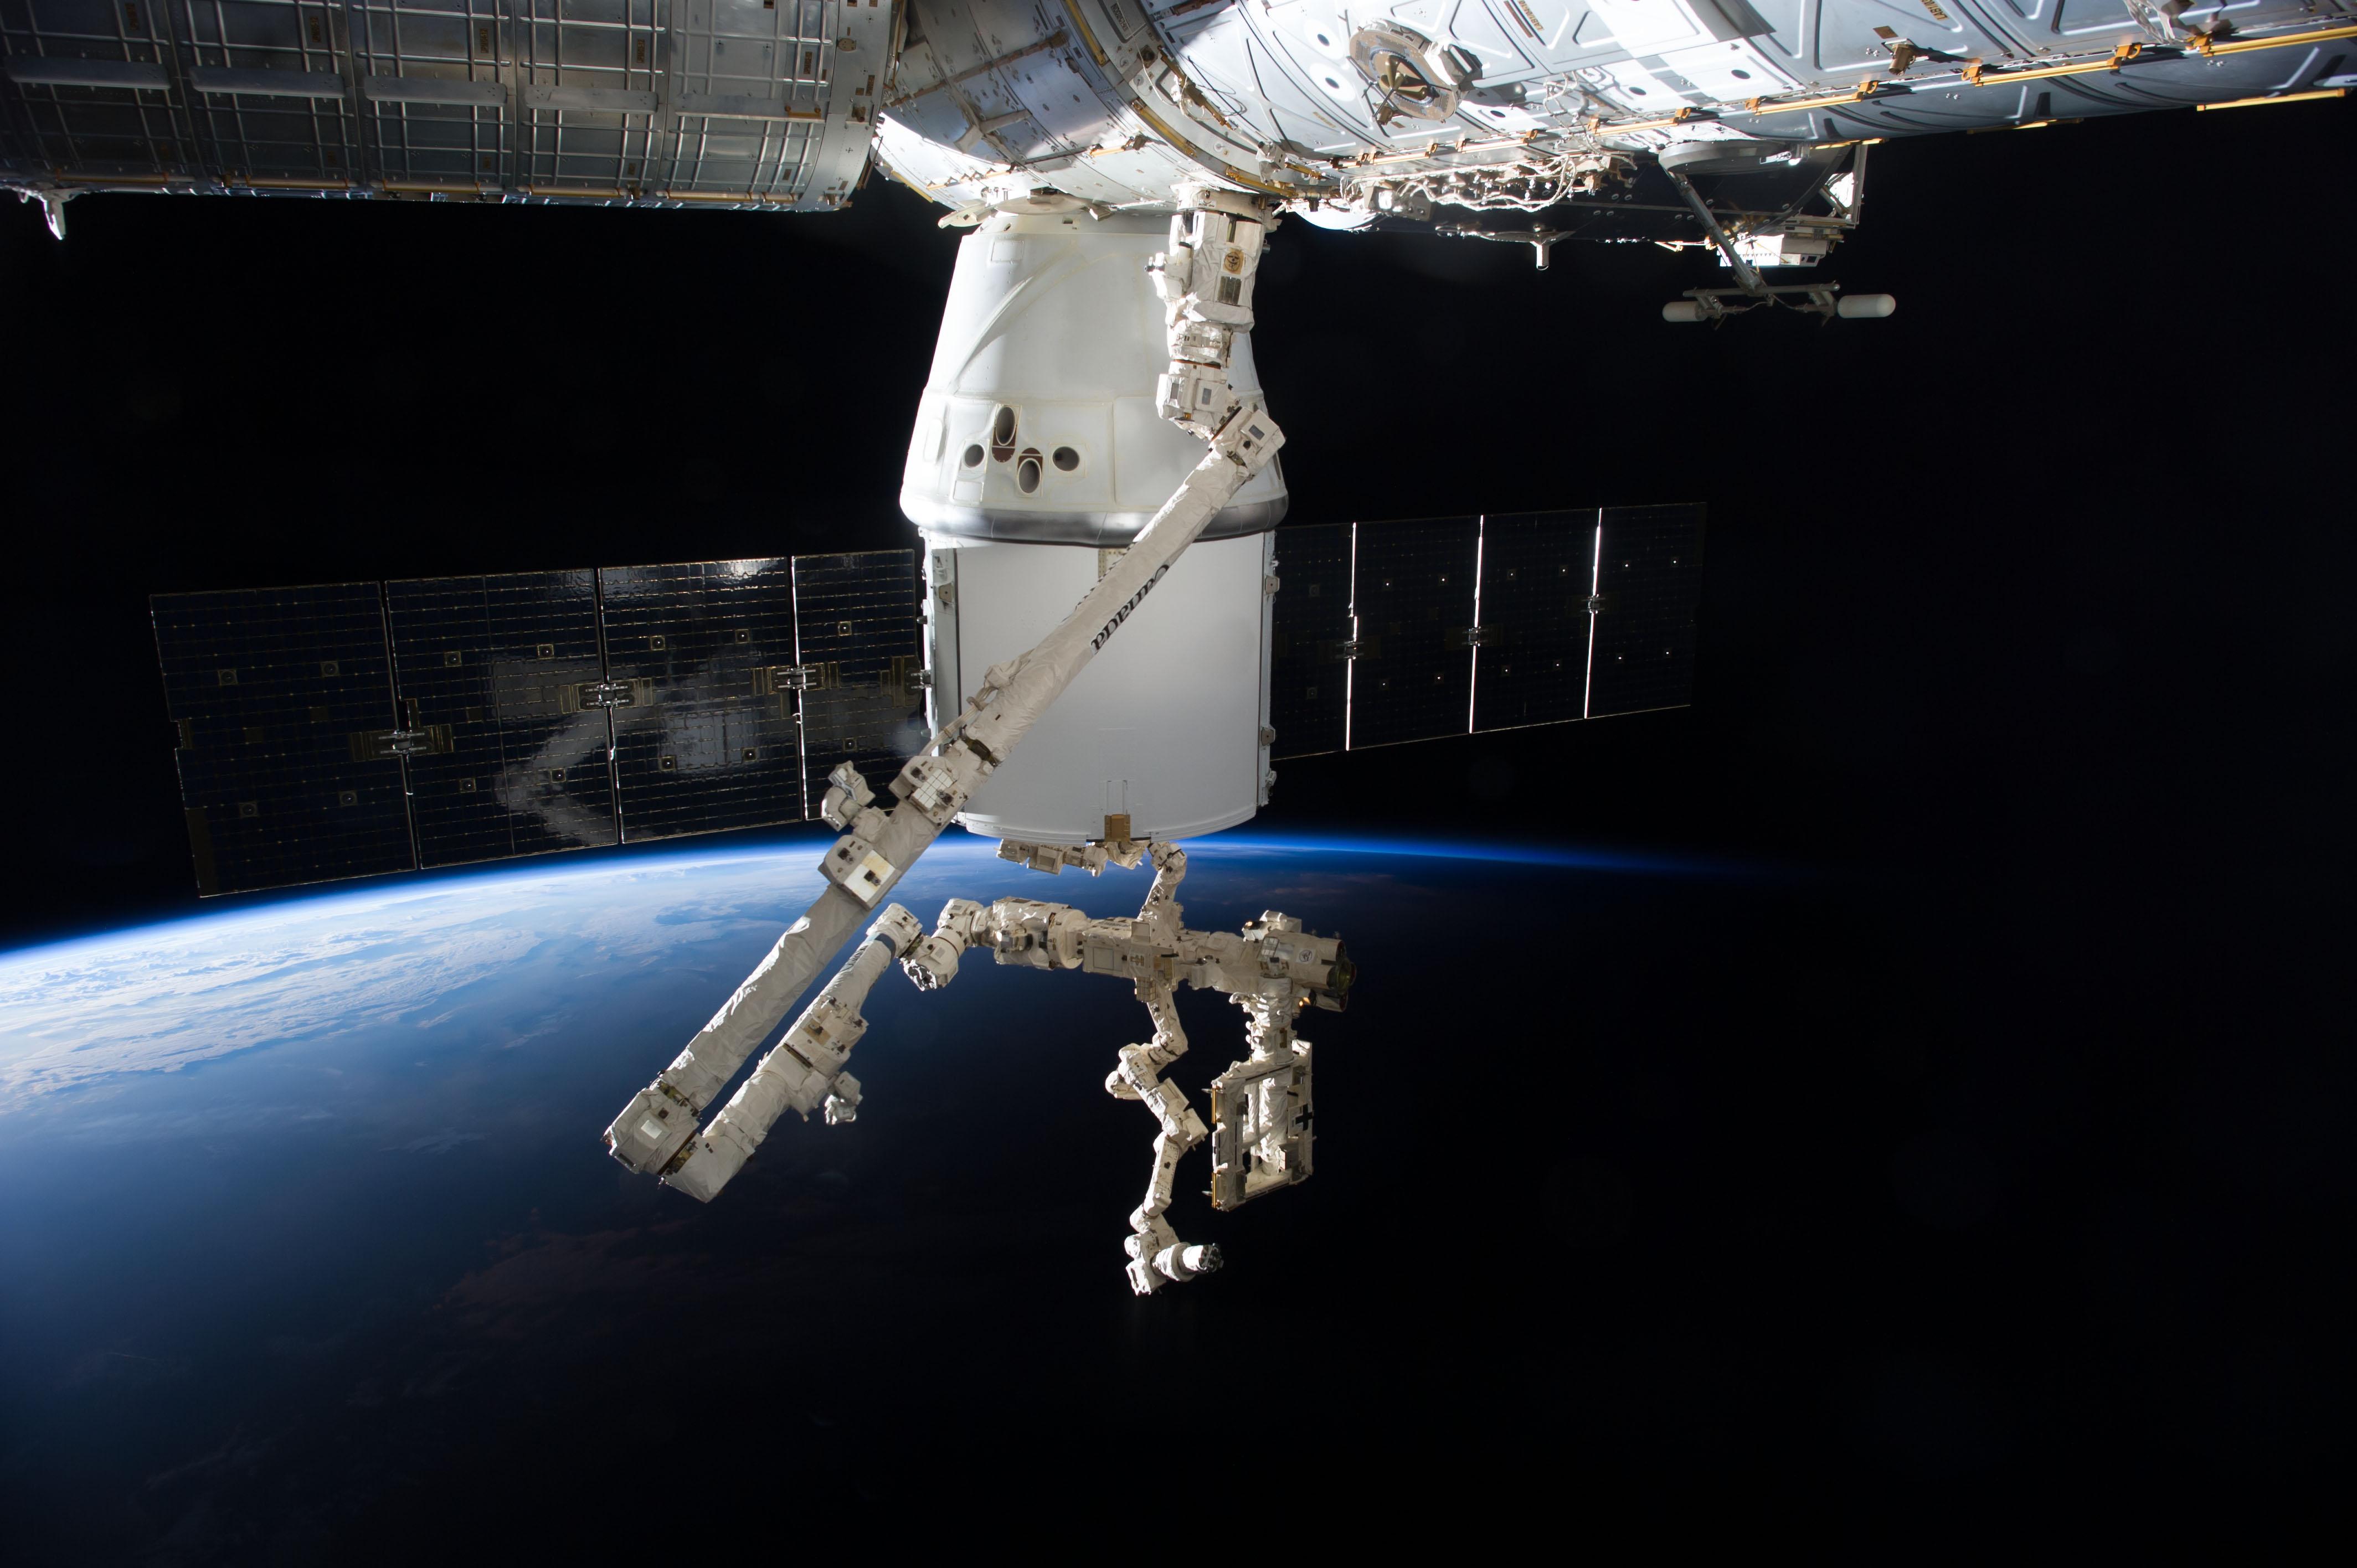 Dragon return set for Saturday | SpaceX